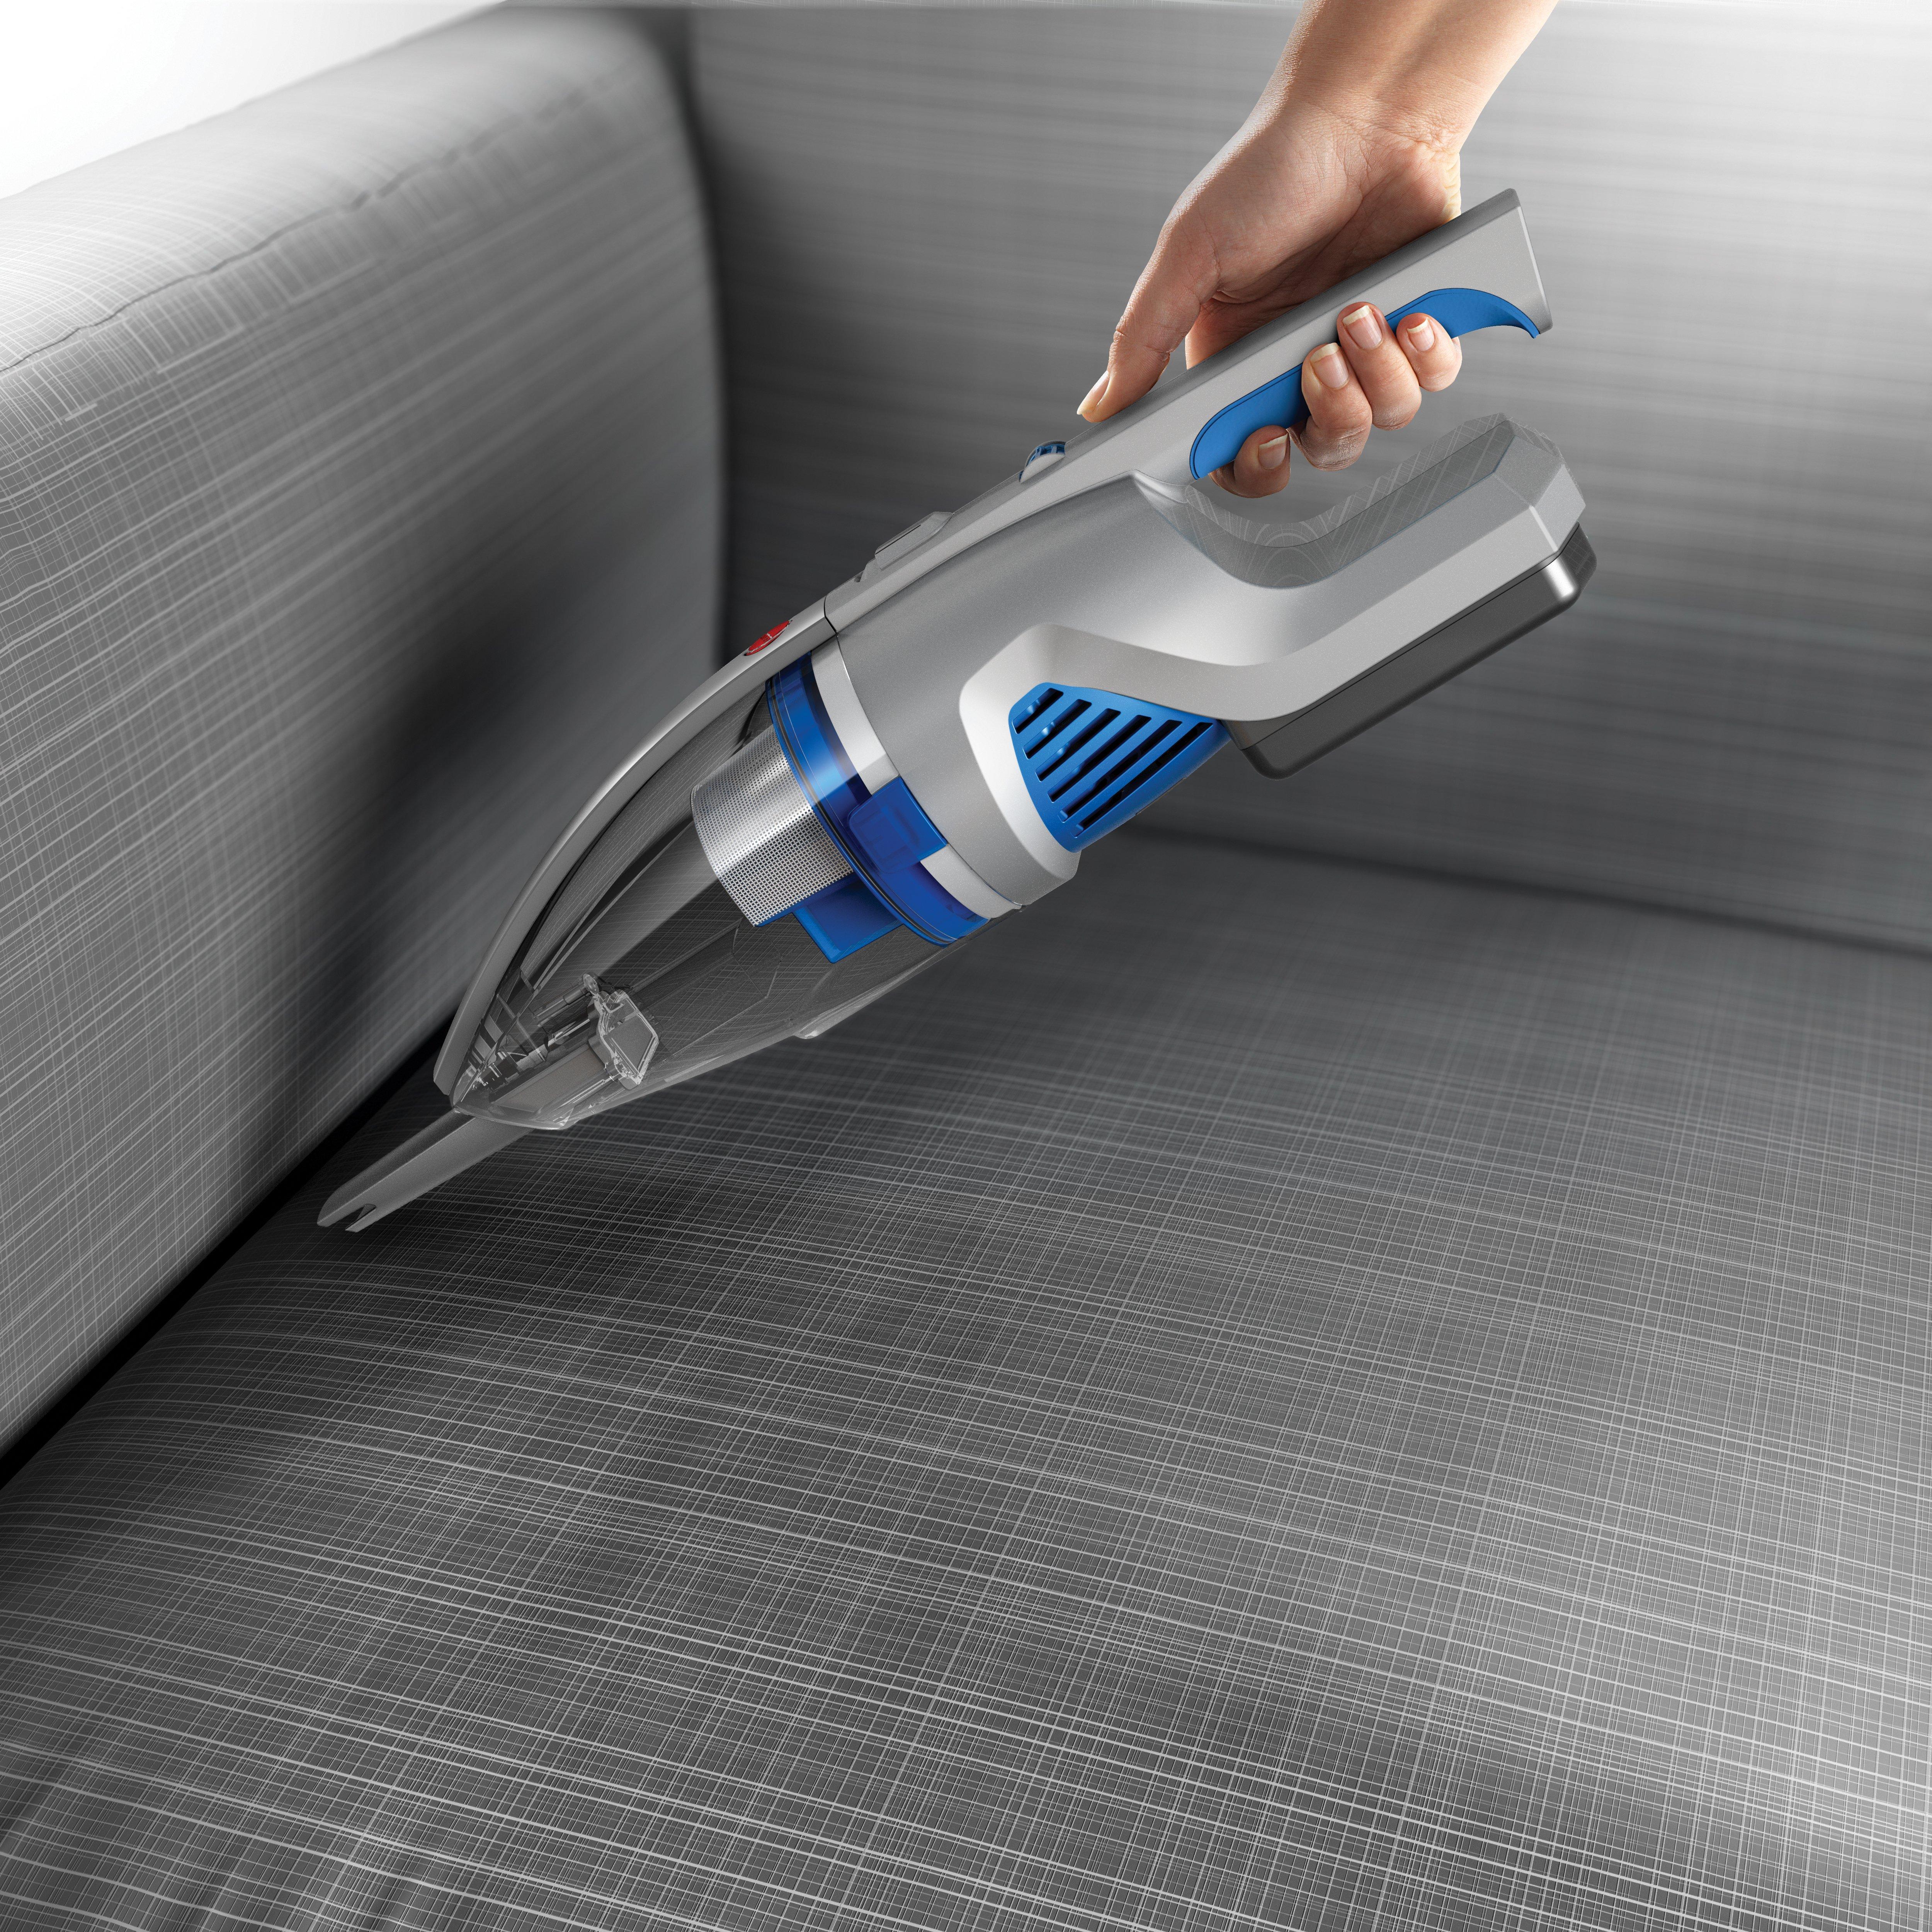 Air Cordless 2-in-1 Stick & Handheld Vacuum6